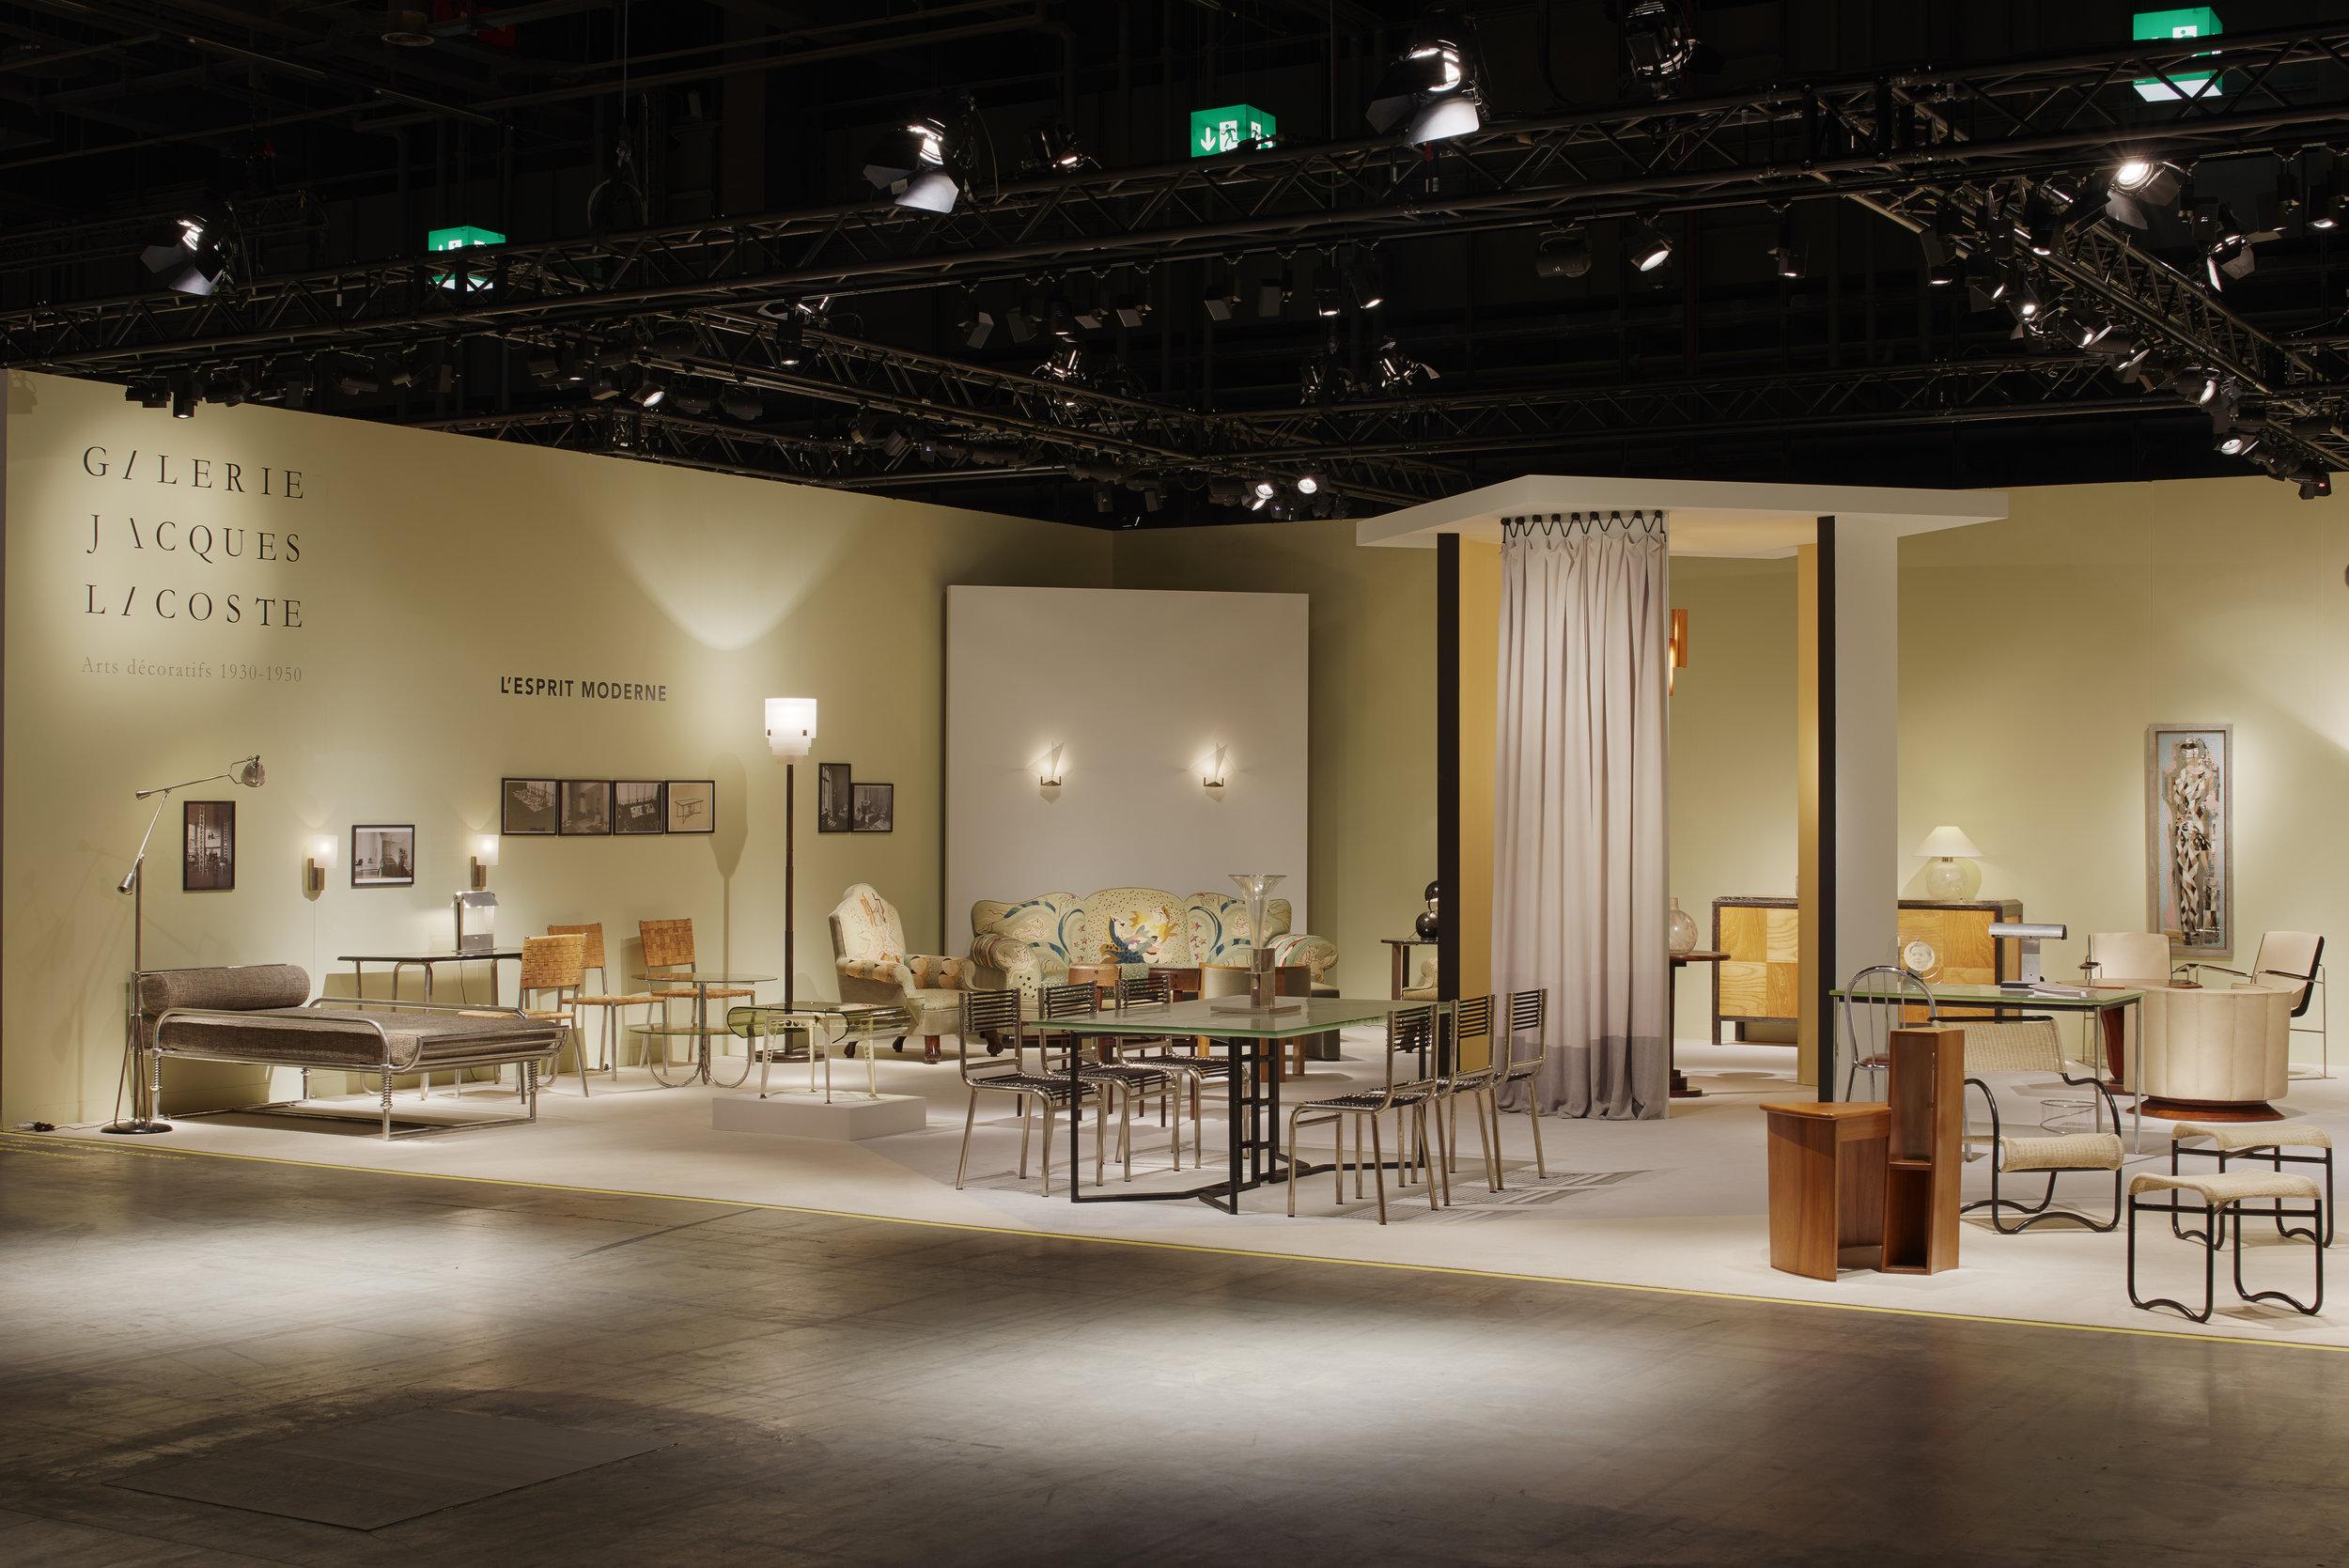 Galerie Jacques Lacoste - Design Miami/Basel 2018 ⓒ  James Harris